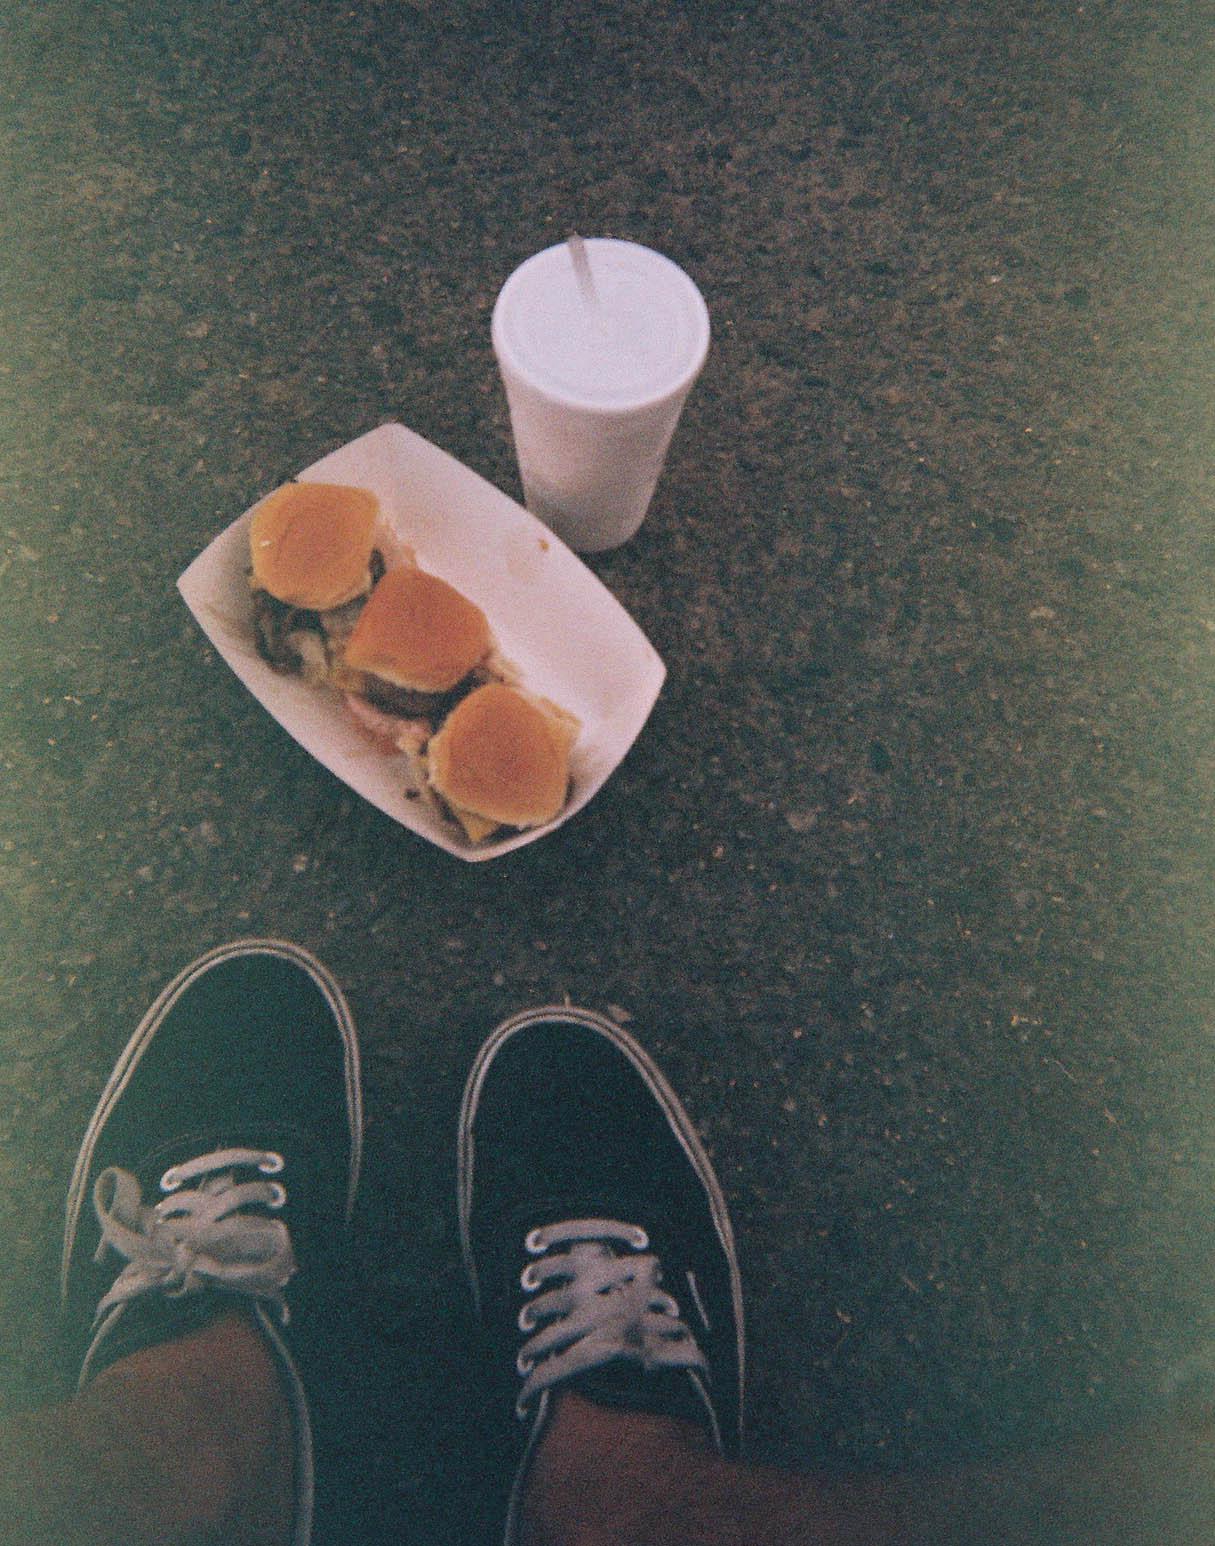 Lunch at Venice Beach, CA